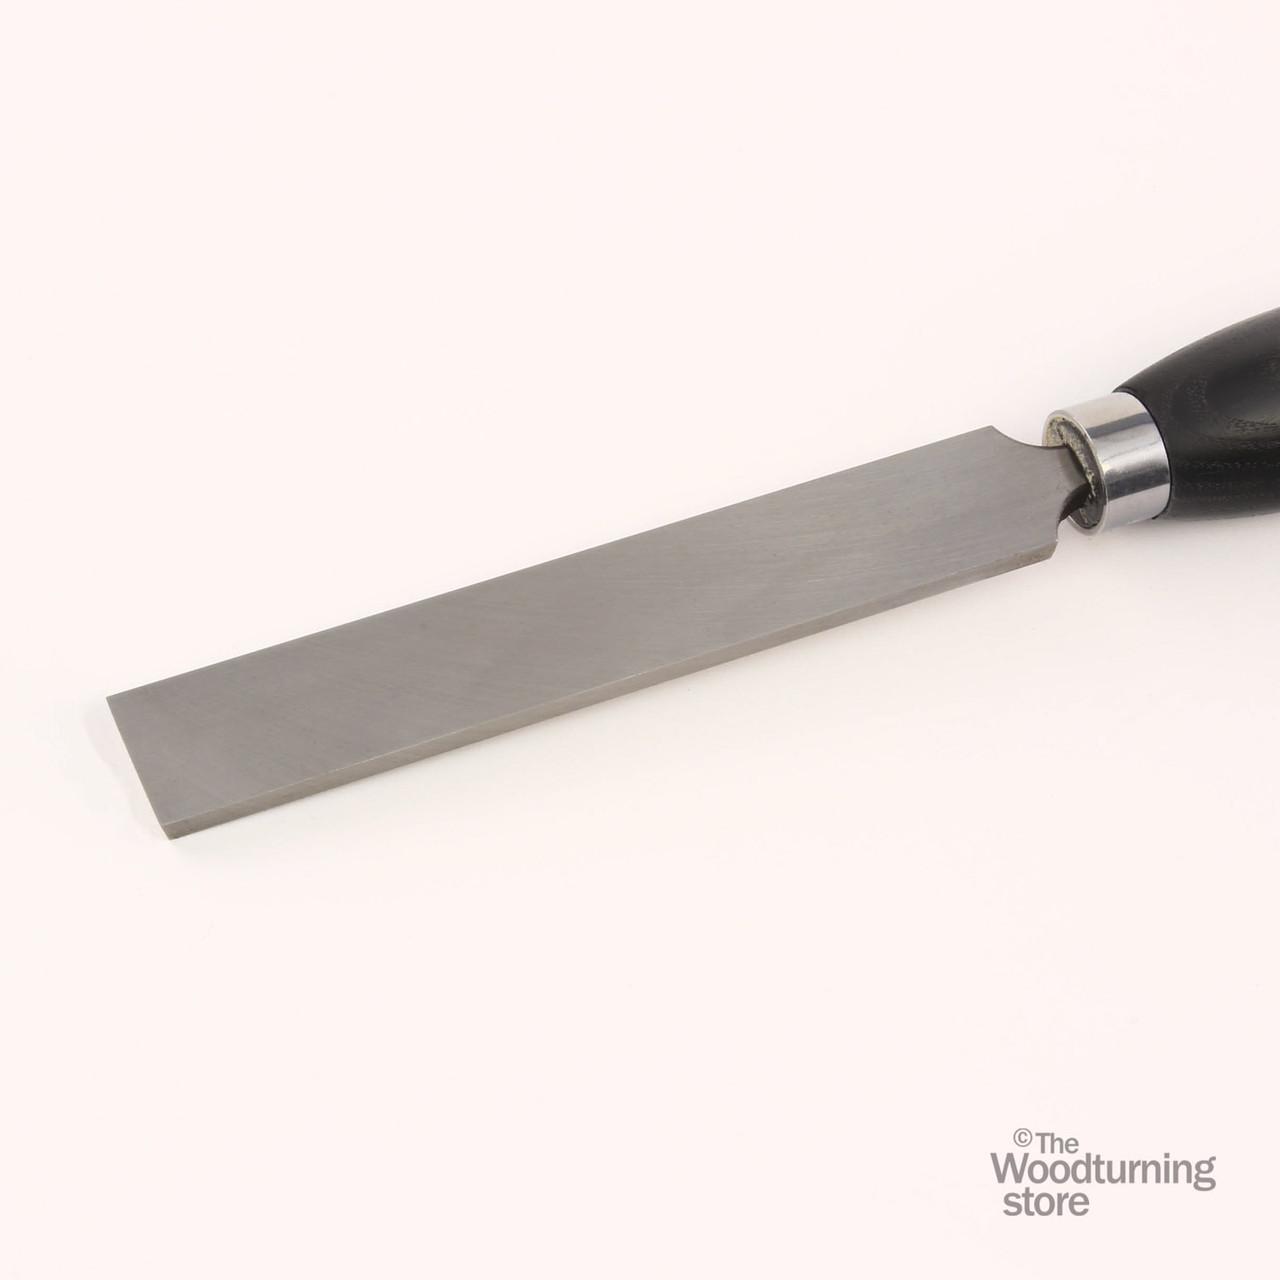 1 1//2 Hurricane Turning Tools x 3//8 Heavy Duty Square Scraper for Woodturning M2 Cryo HTT-256KW